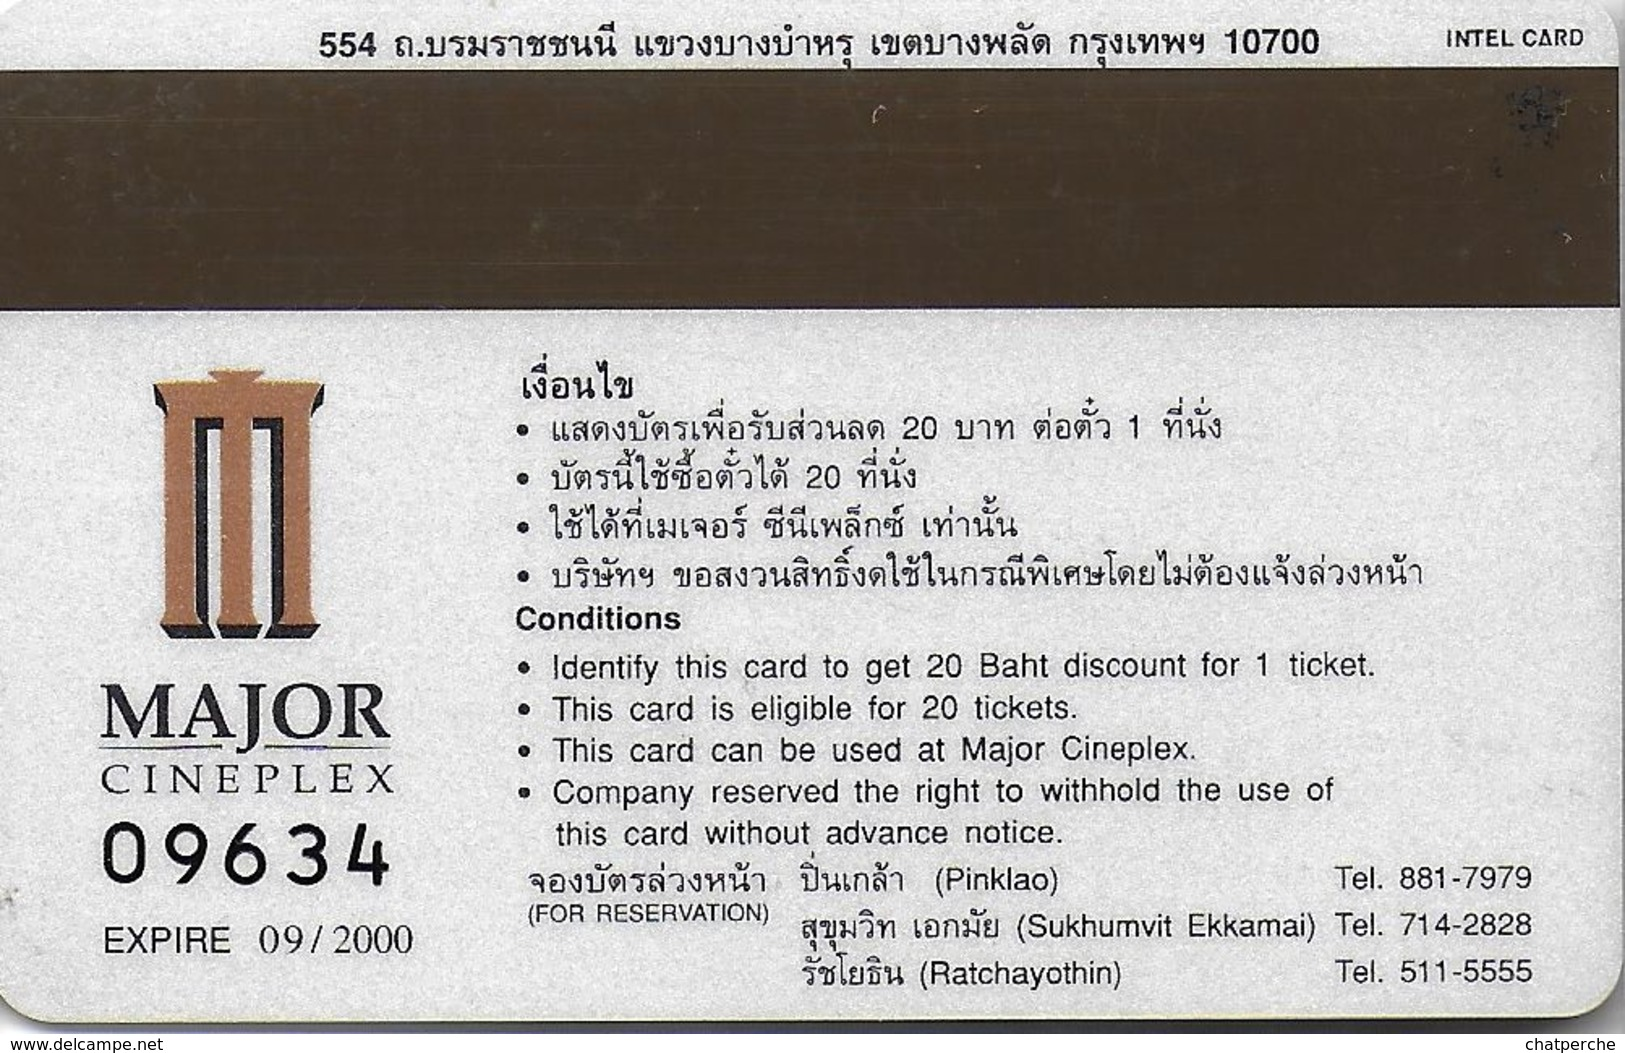 THAÏLANDE CINECARTE PHONECARD CARTE BANDE MAGNETIQUE TARZAN DESSIN ANIME DISNEY 09/2000  MAJOR CINEPLEX - Thaïlande